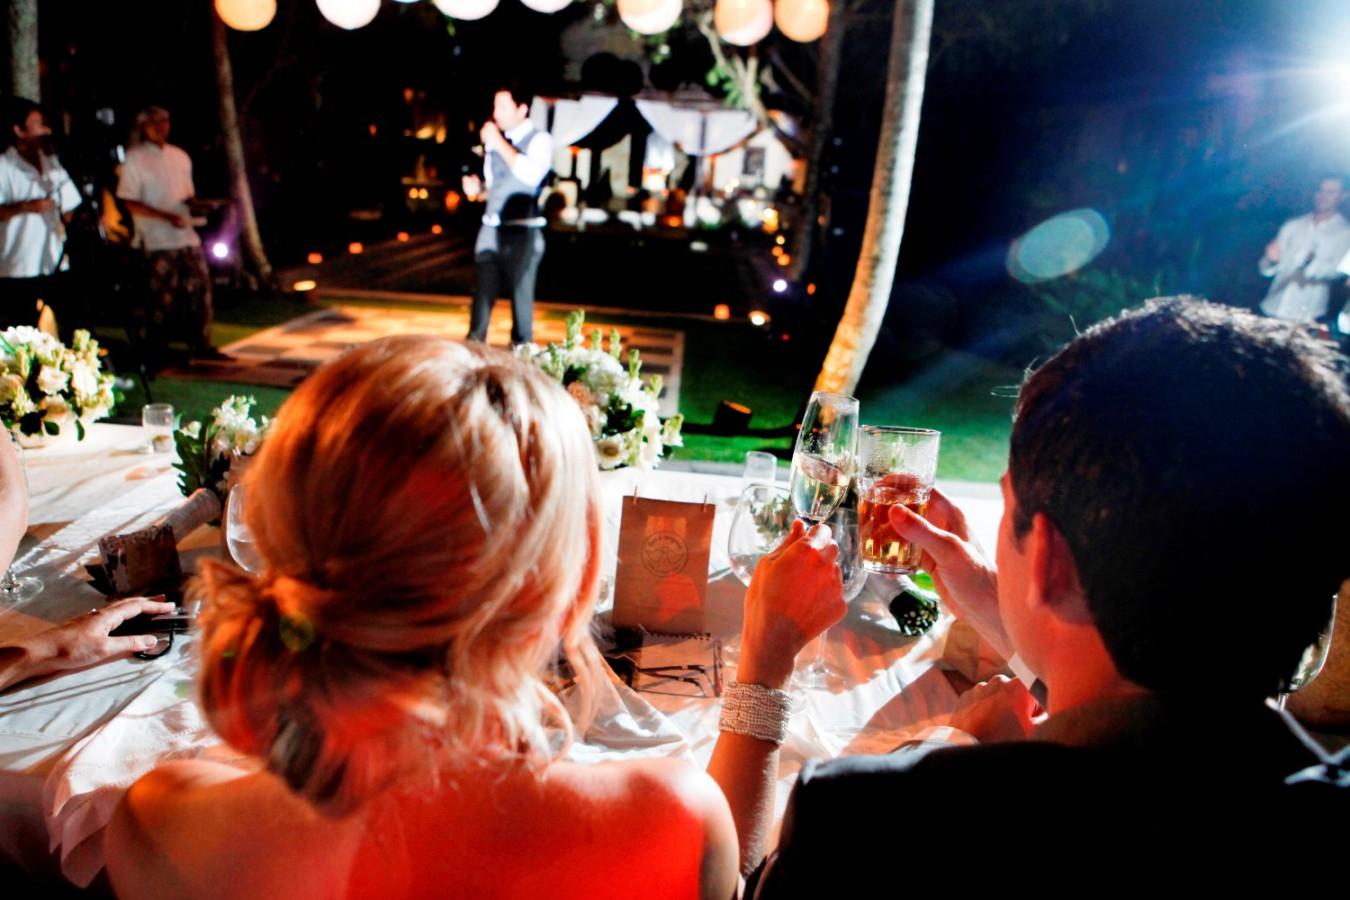 2011.10.16, Megann and Daniel, Ombak Luwung, MJY - Bali Wedding Paradise (32)